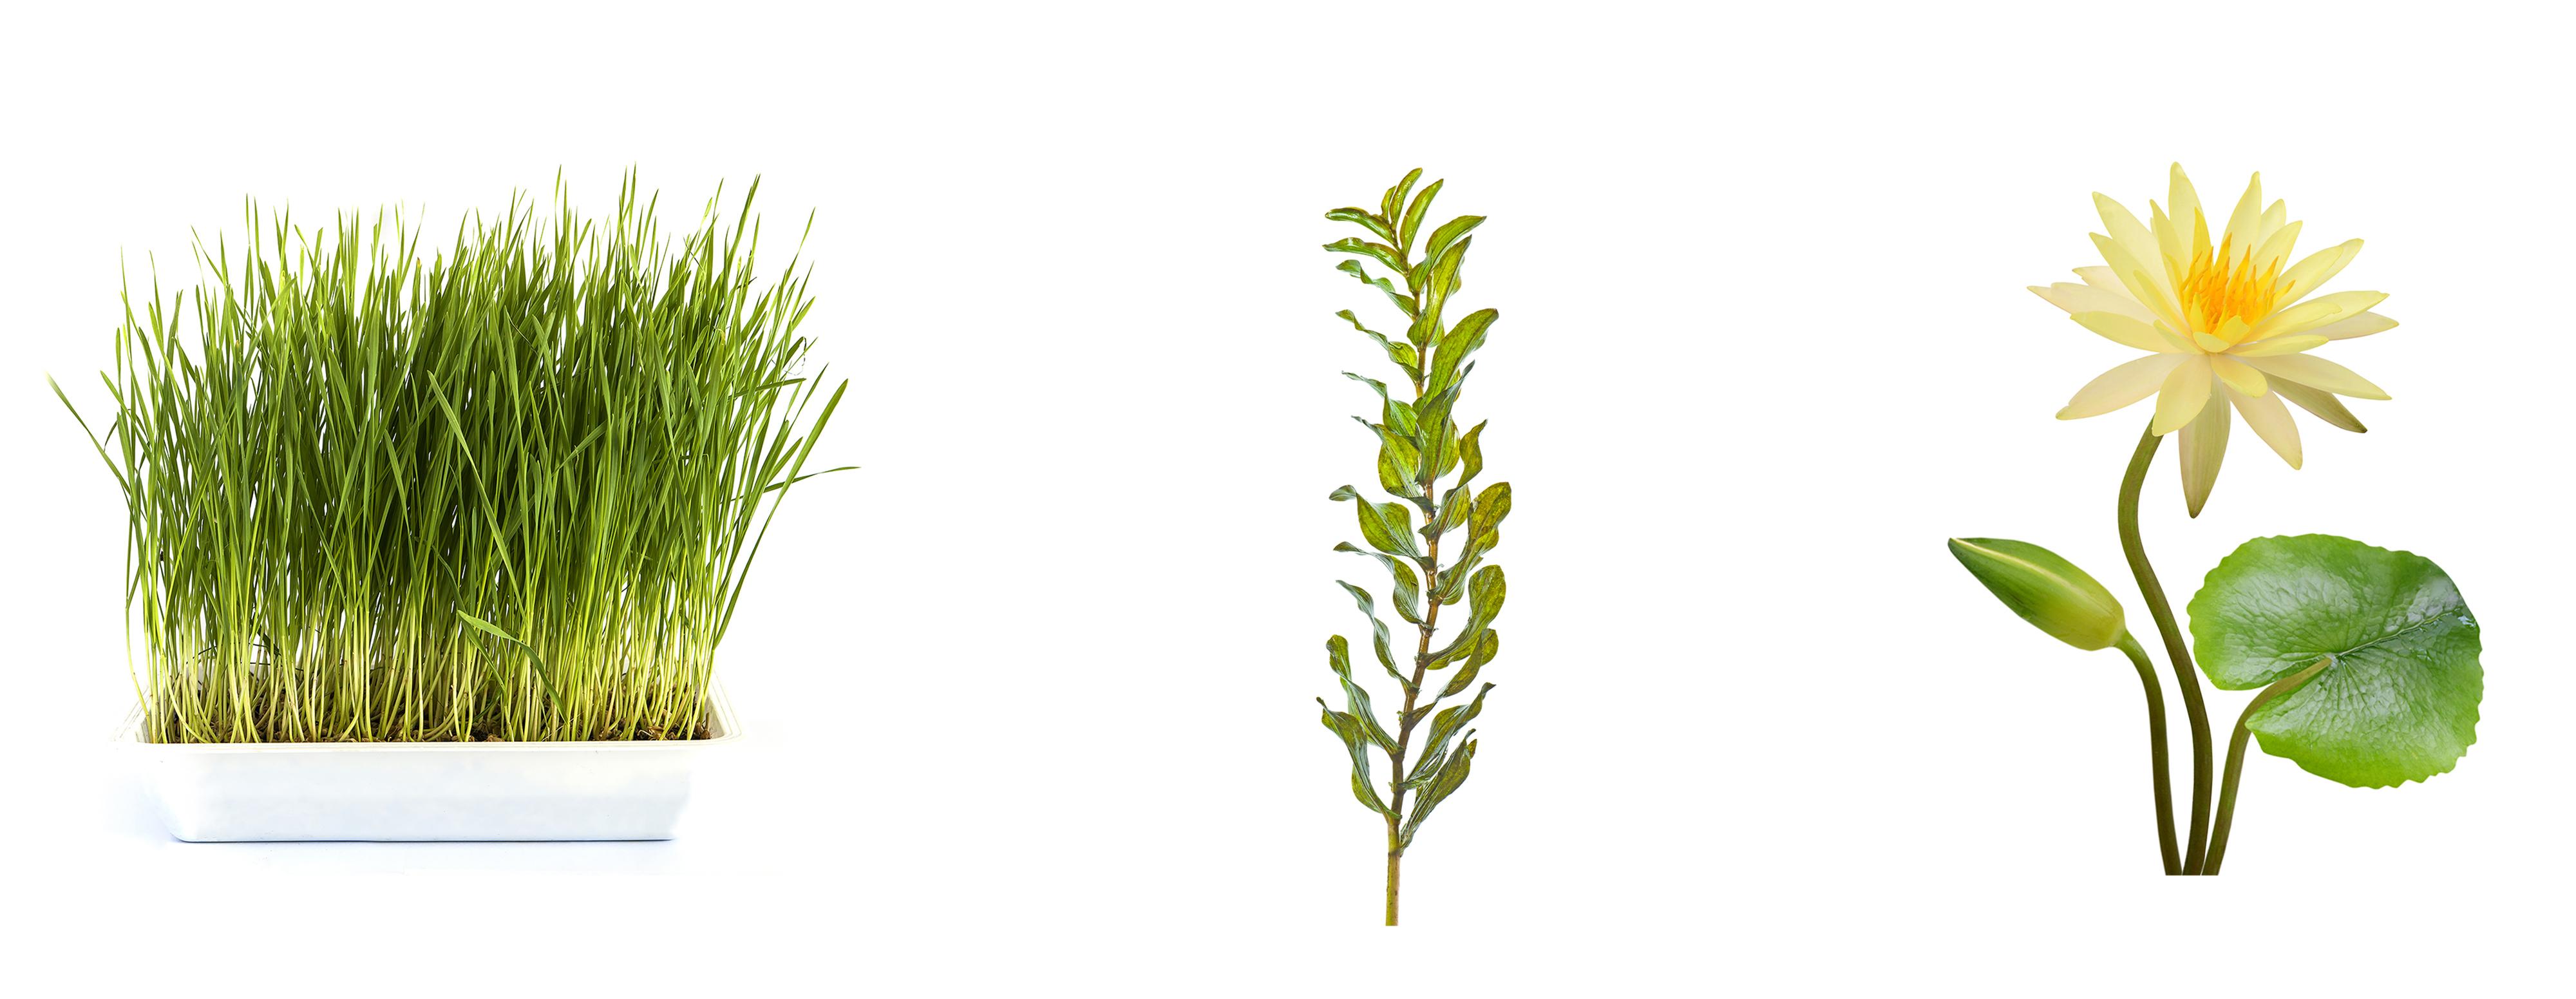 Worksheet Classification Of Plants